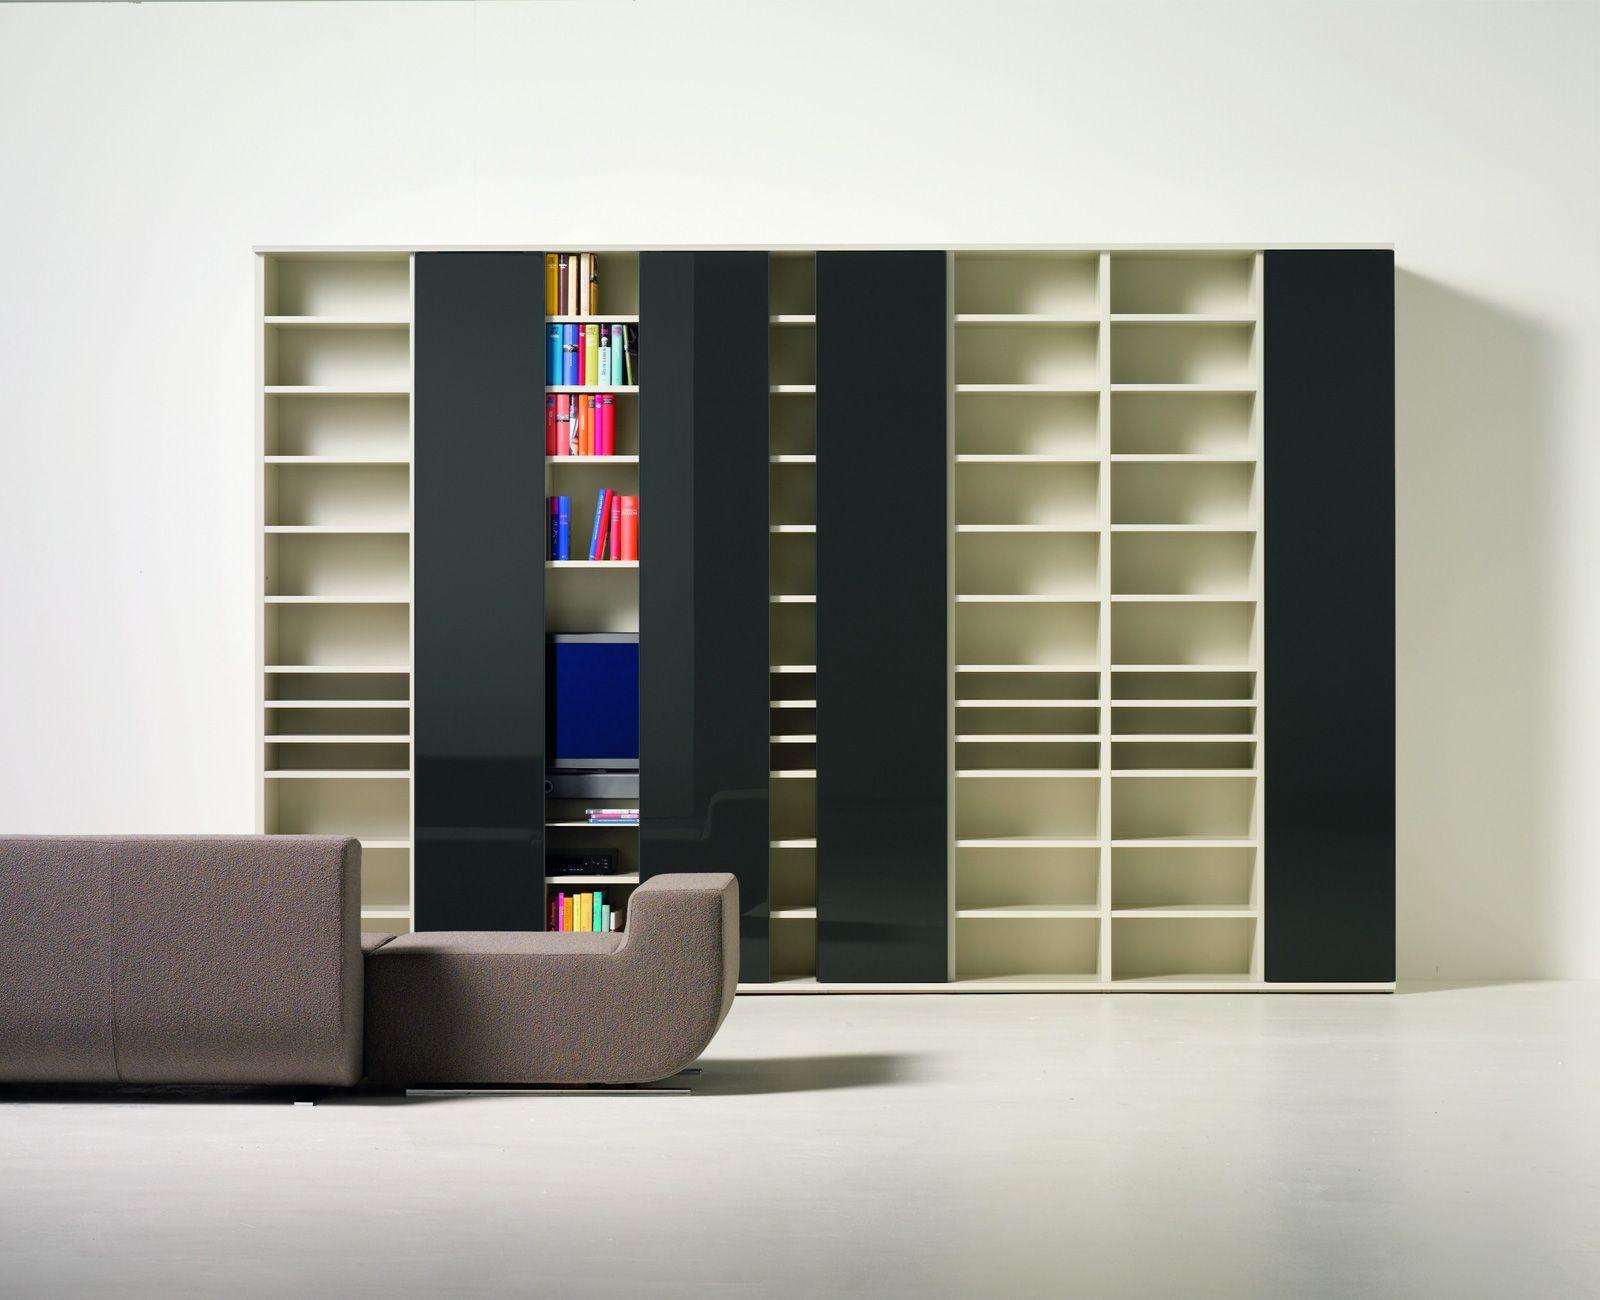 Studimo Interlubke Forza New Home Inspiration Pinterest  # Meuble Tv Forza